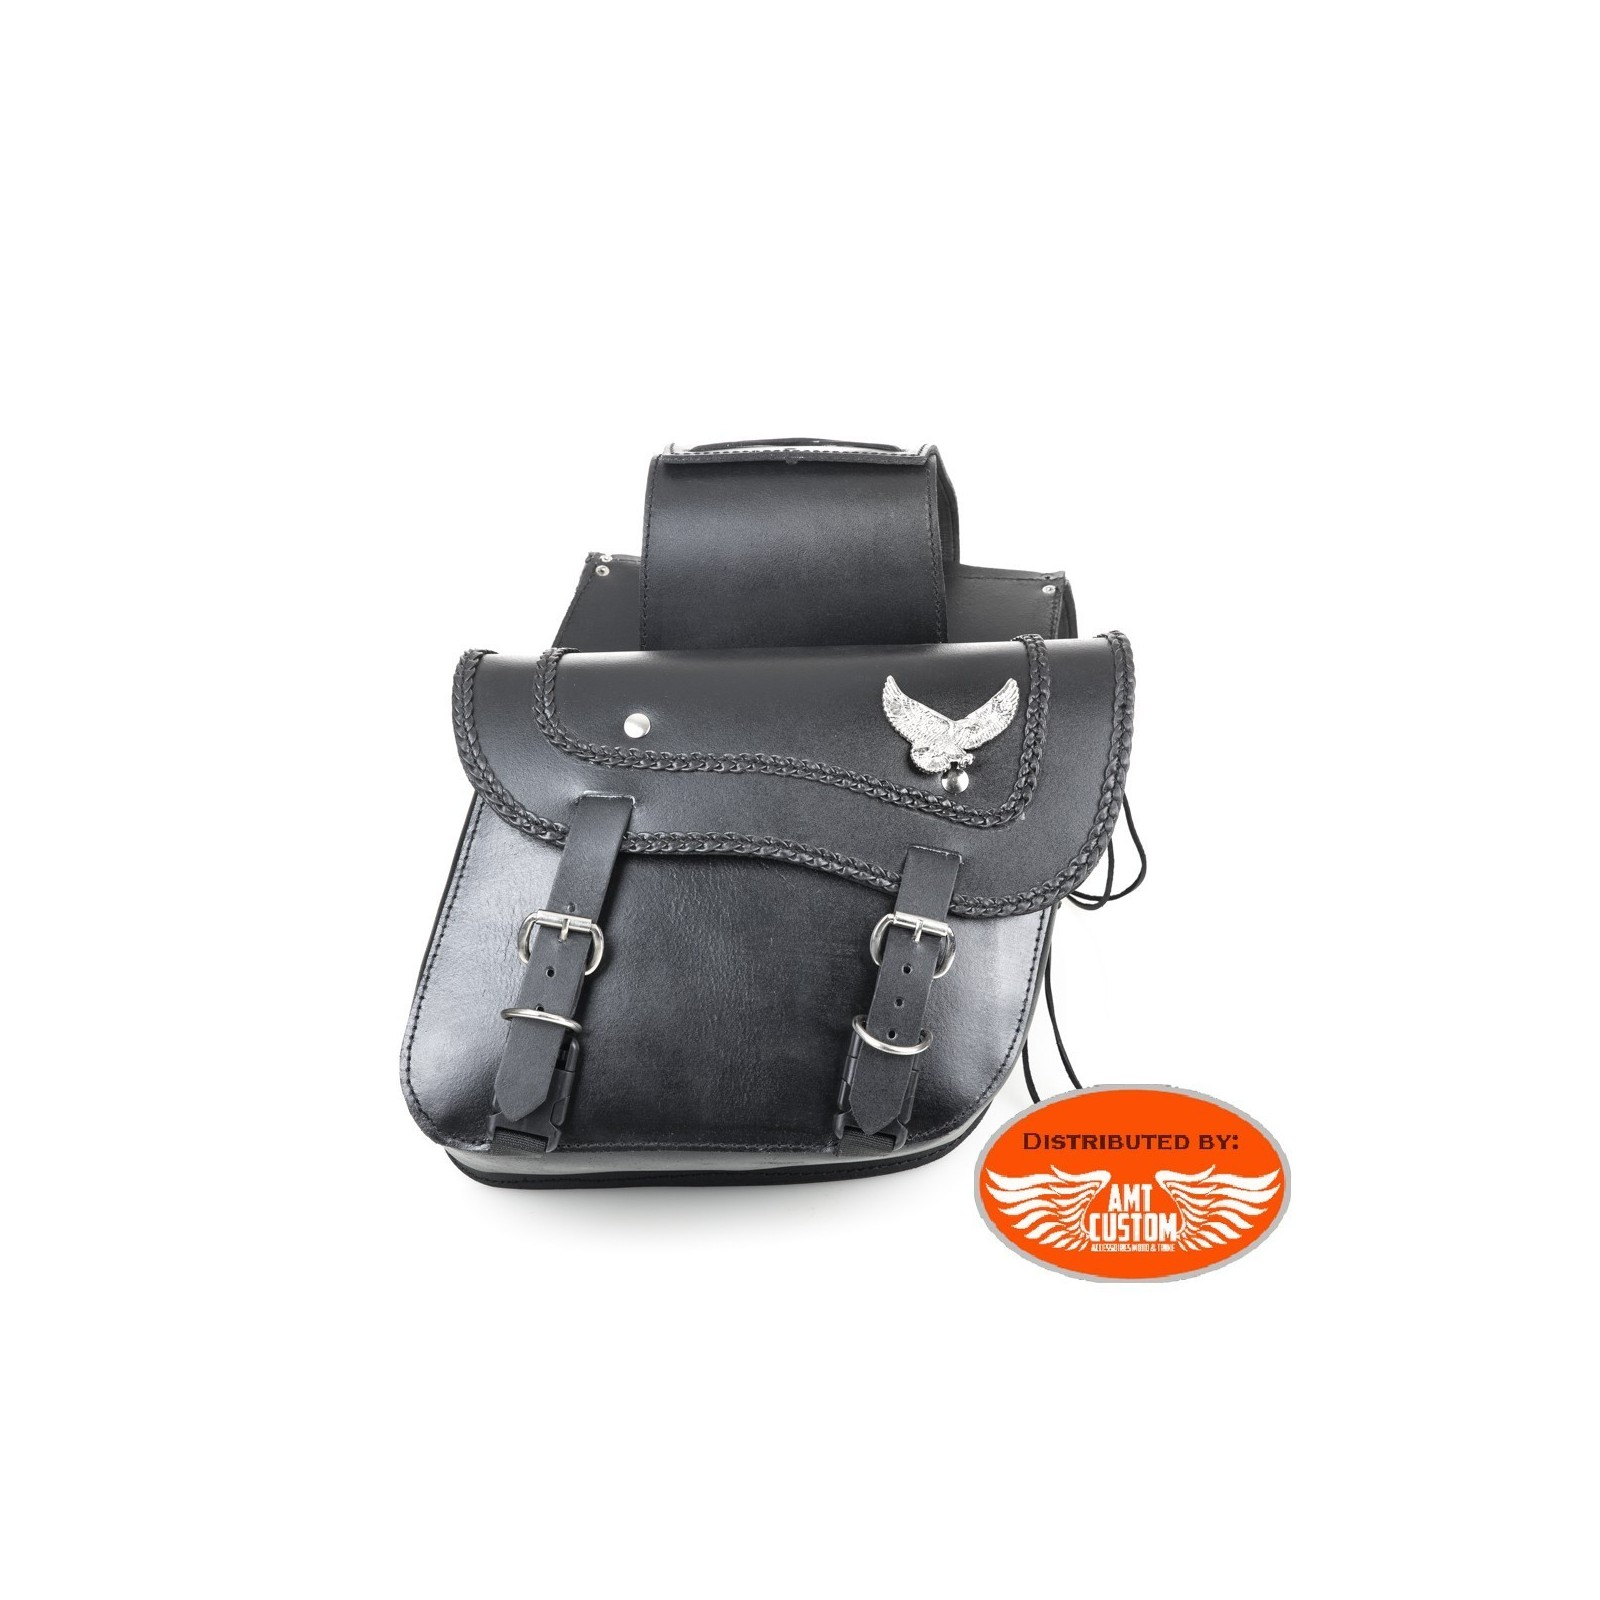 Moto Custom Sacoches cavali/ères Cuir Aigle verrouillable